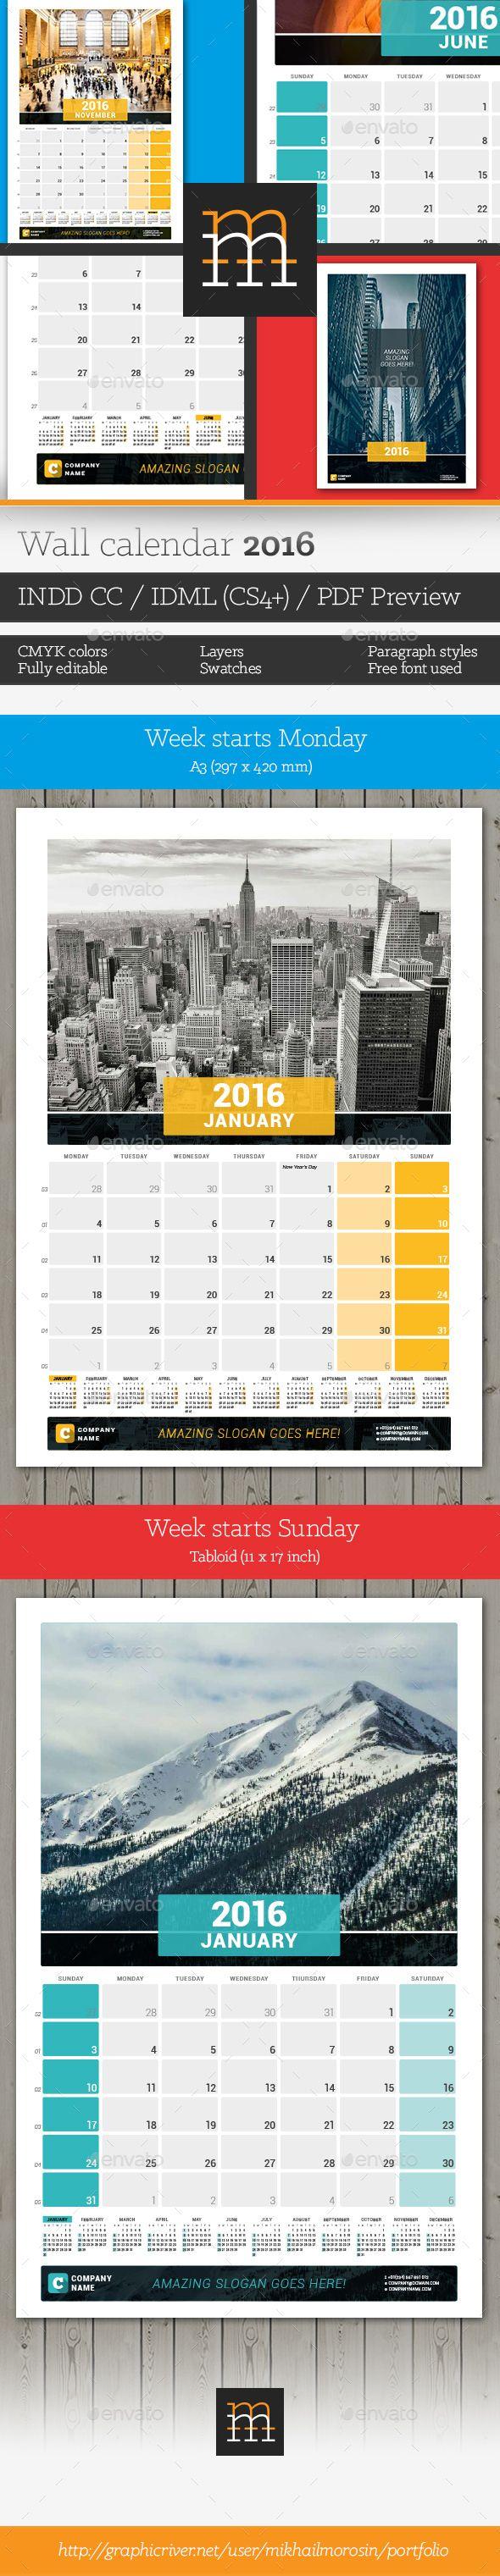 Wall Calendar 2016 Template InDesign INDD #design Download: http://graphicriver.net/item/wall-calendar-2016-/13321065?ref=ksioks